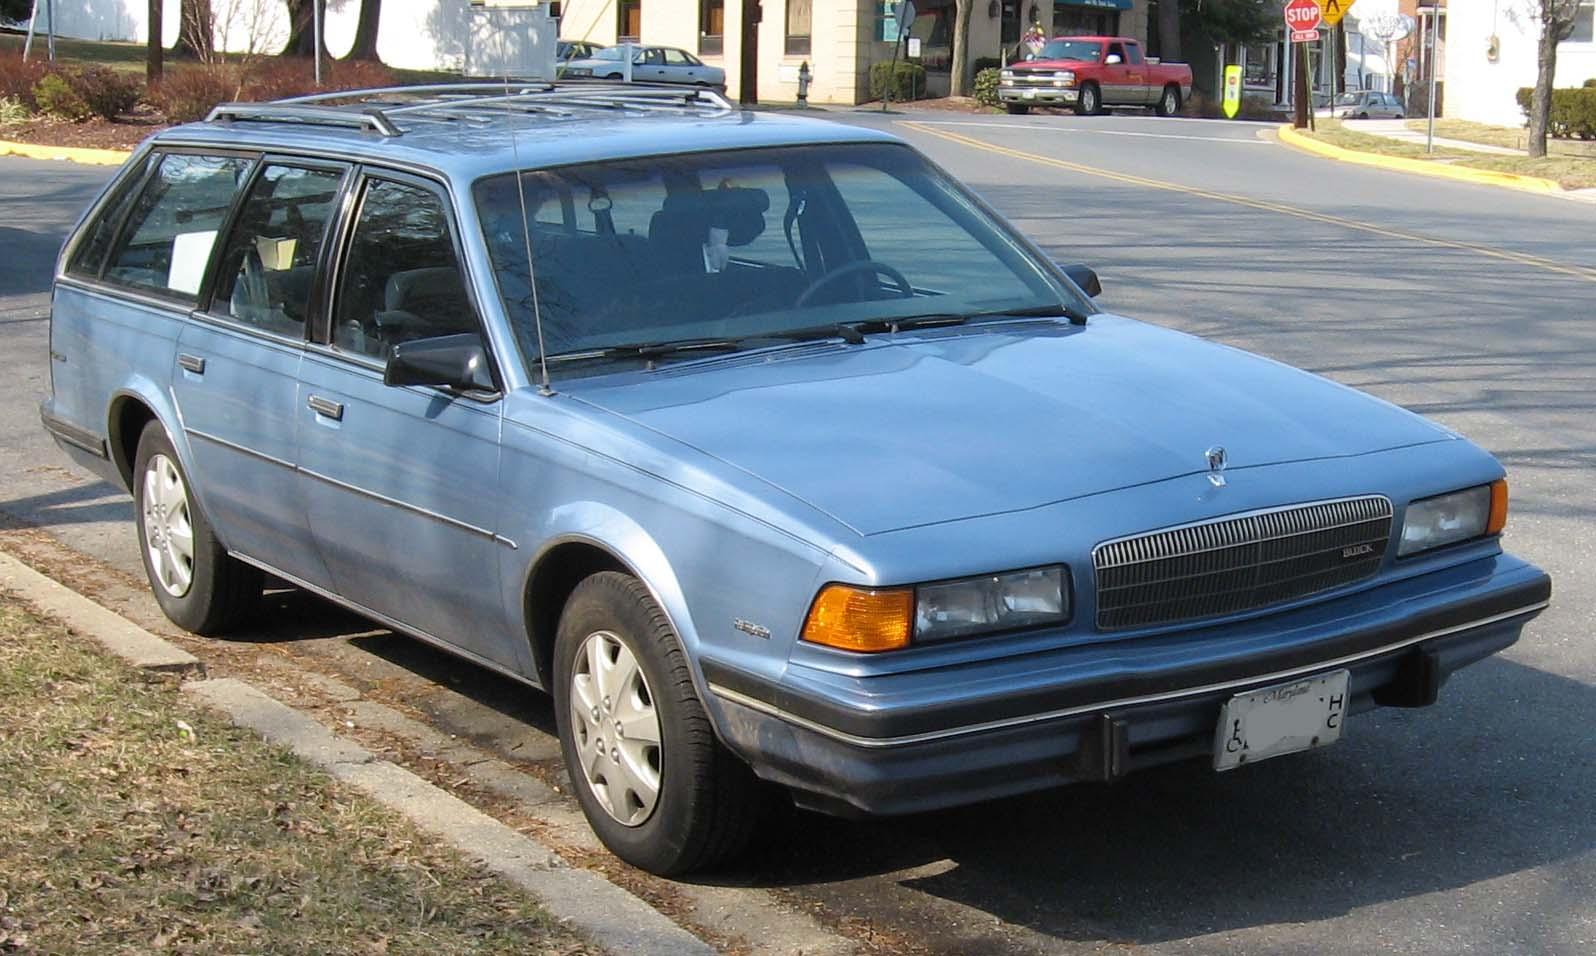 File:1989-1990 Buick Century Wagon.jpg - Wikimedia Commons